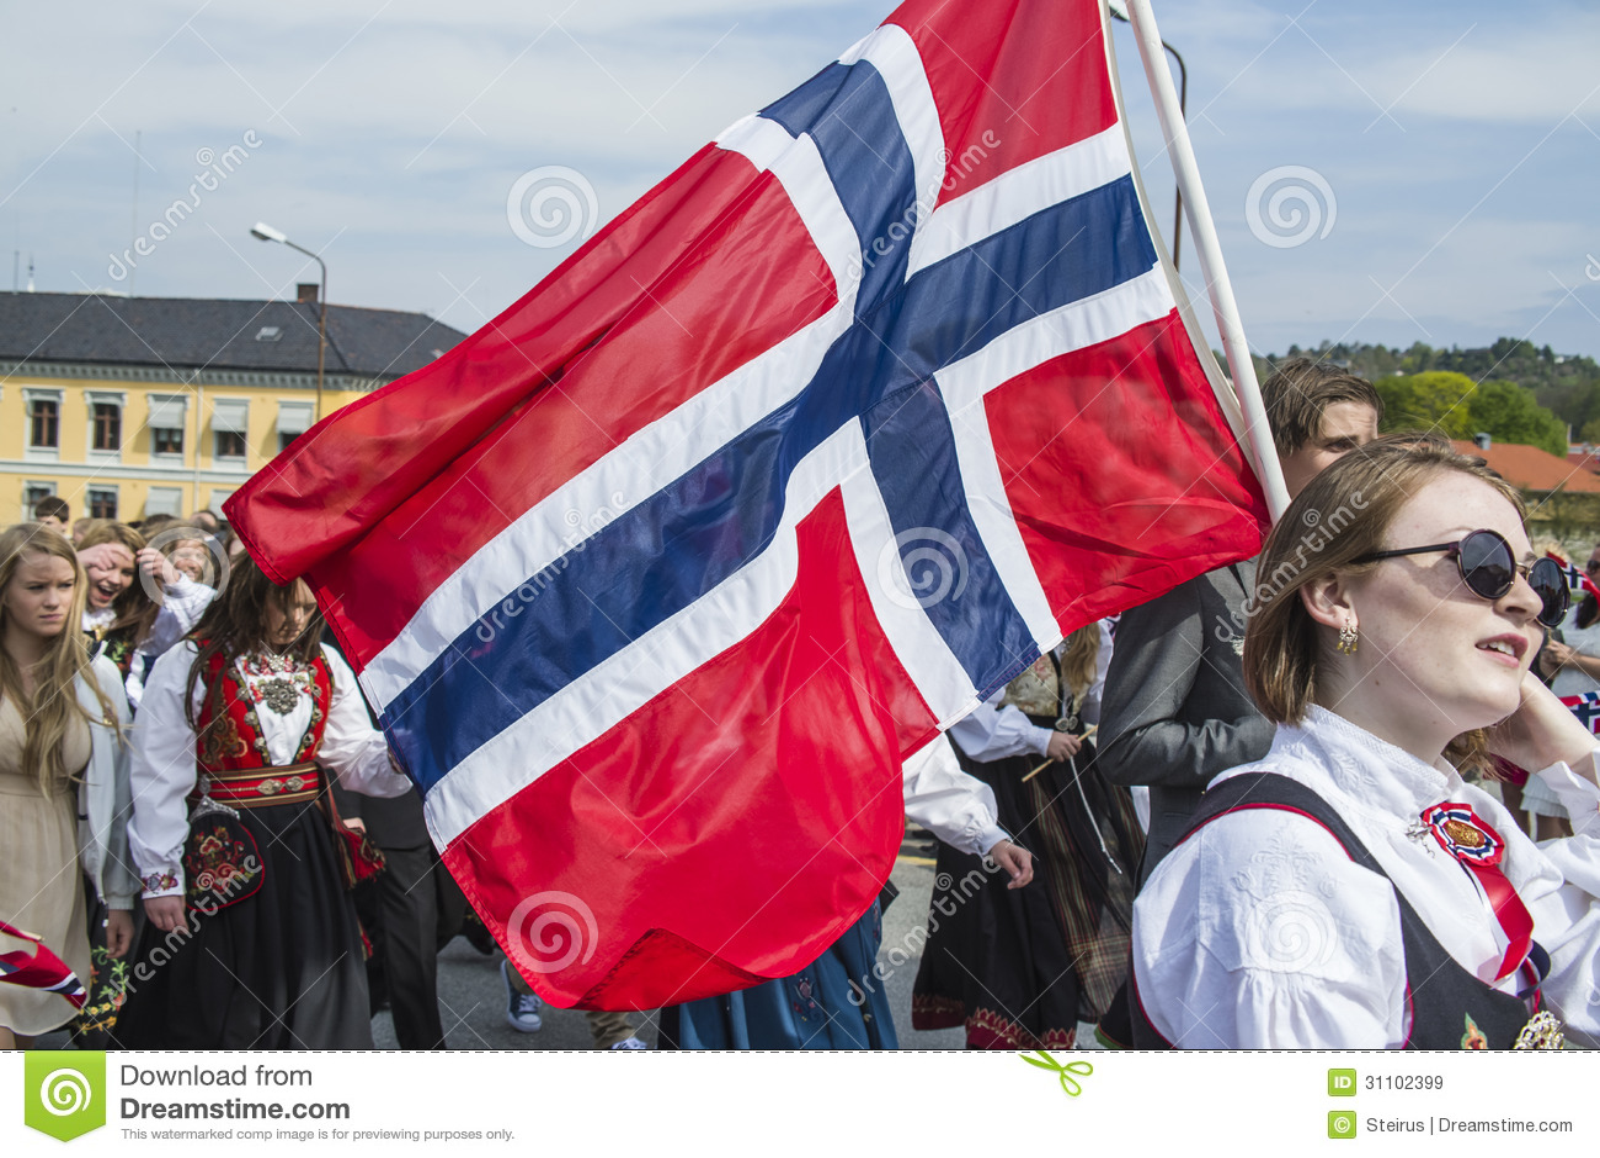 norske datingsider gratis time and date oslo